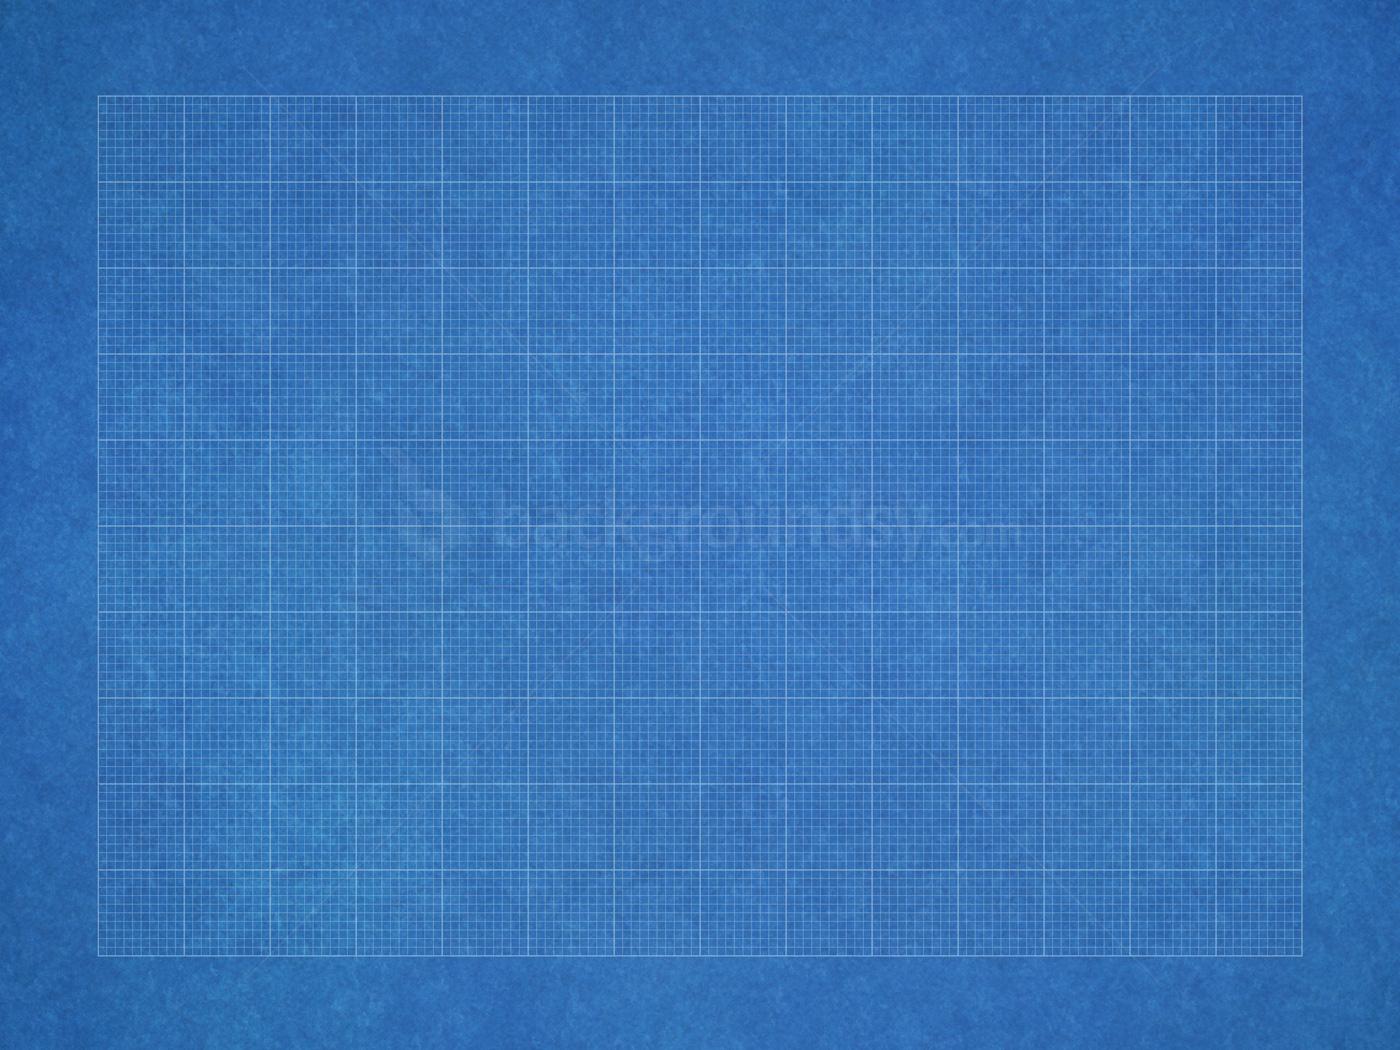 Blueprint Wallpaper Iphone 6 Blueprint Grid Paper Backgroundsy Com